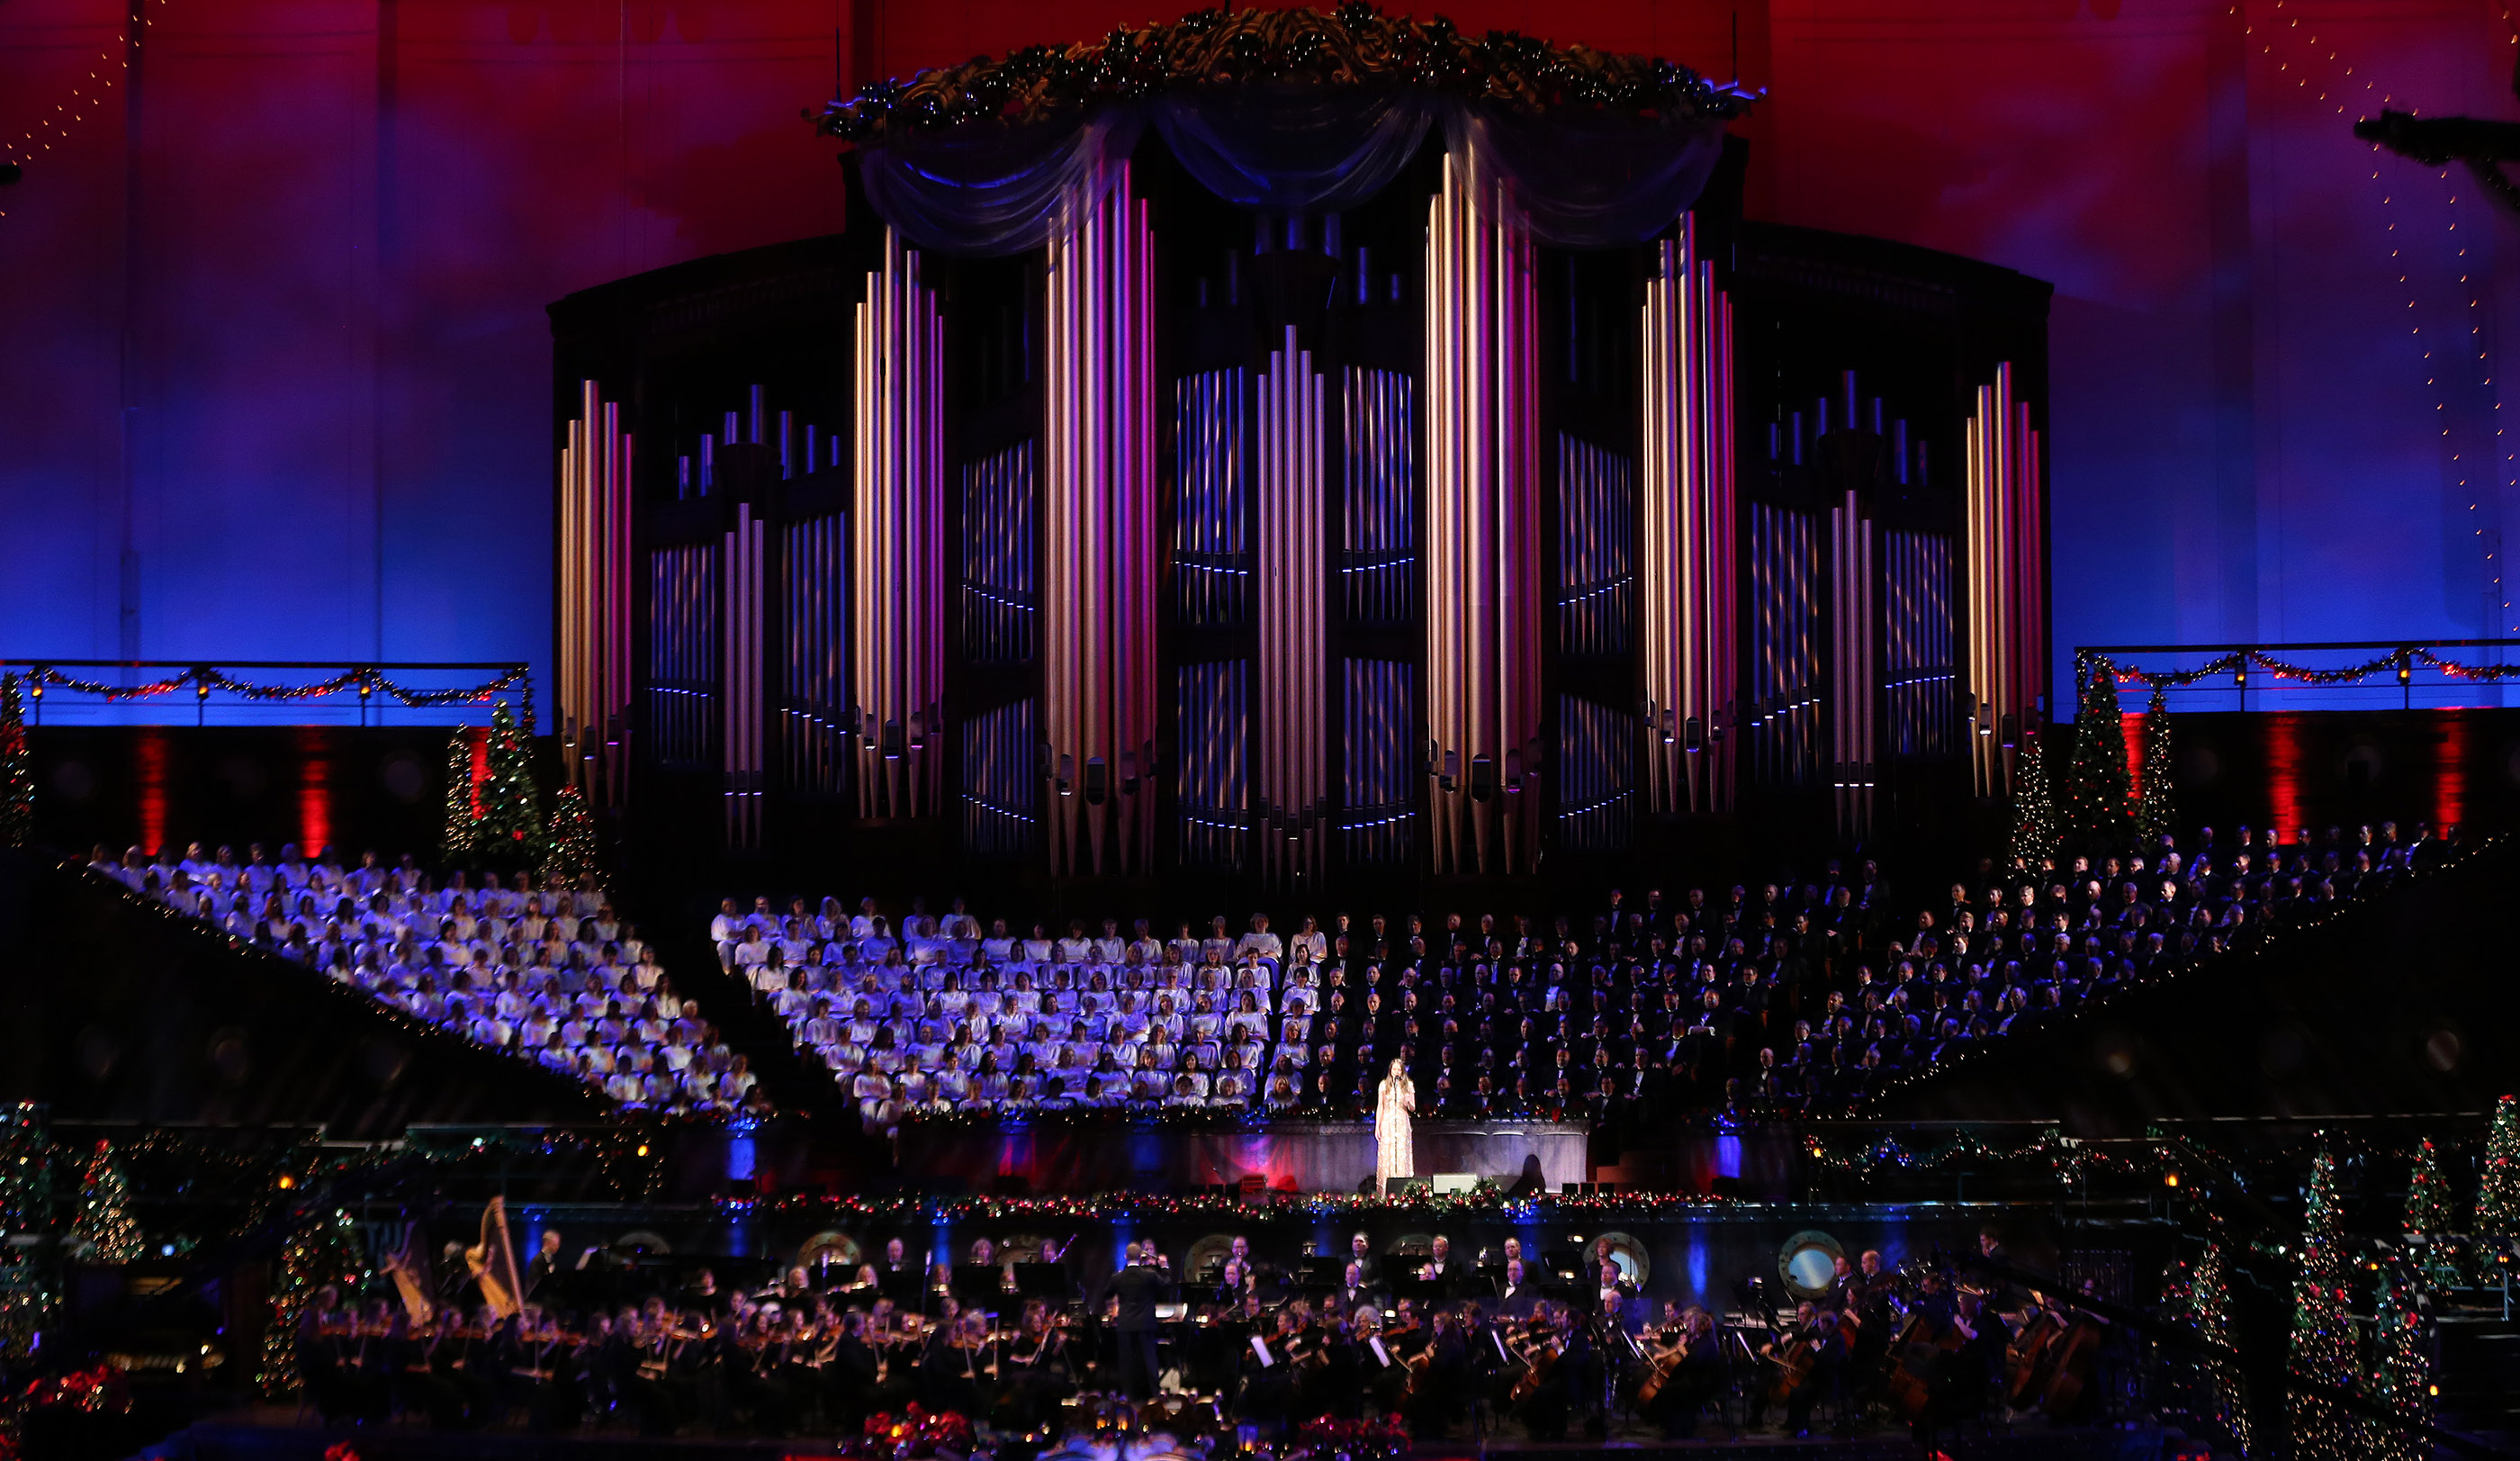 2019 Mormon Tabernacle Choir Christmas Concert Sutton Foster, Hugh Bonneville Highlight Mormon Tabernacle Choir's